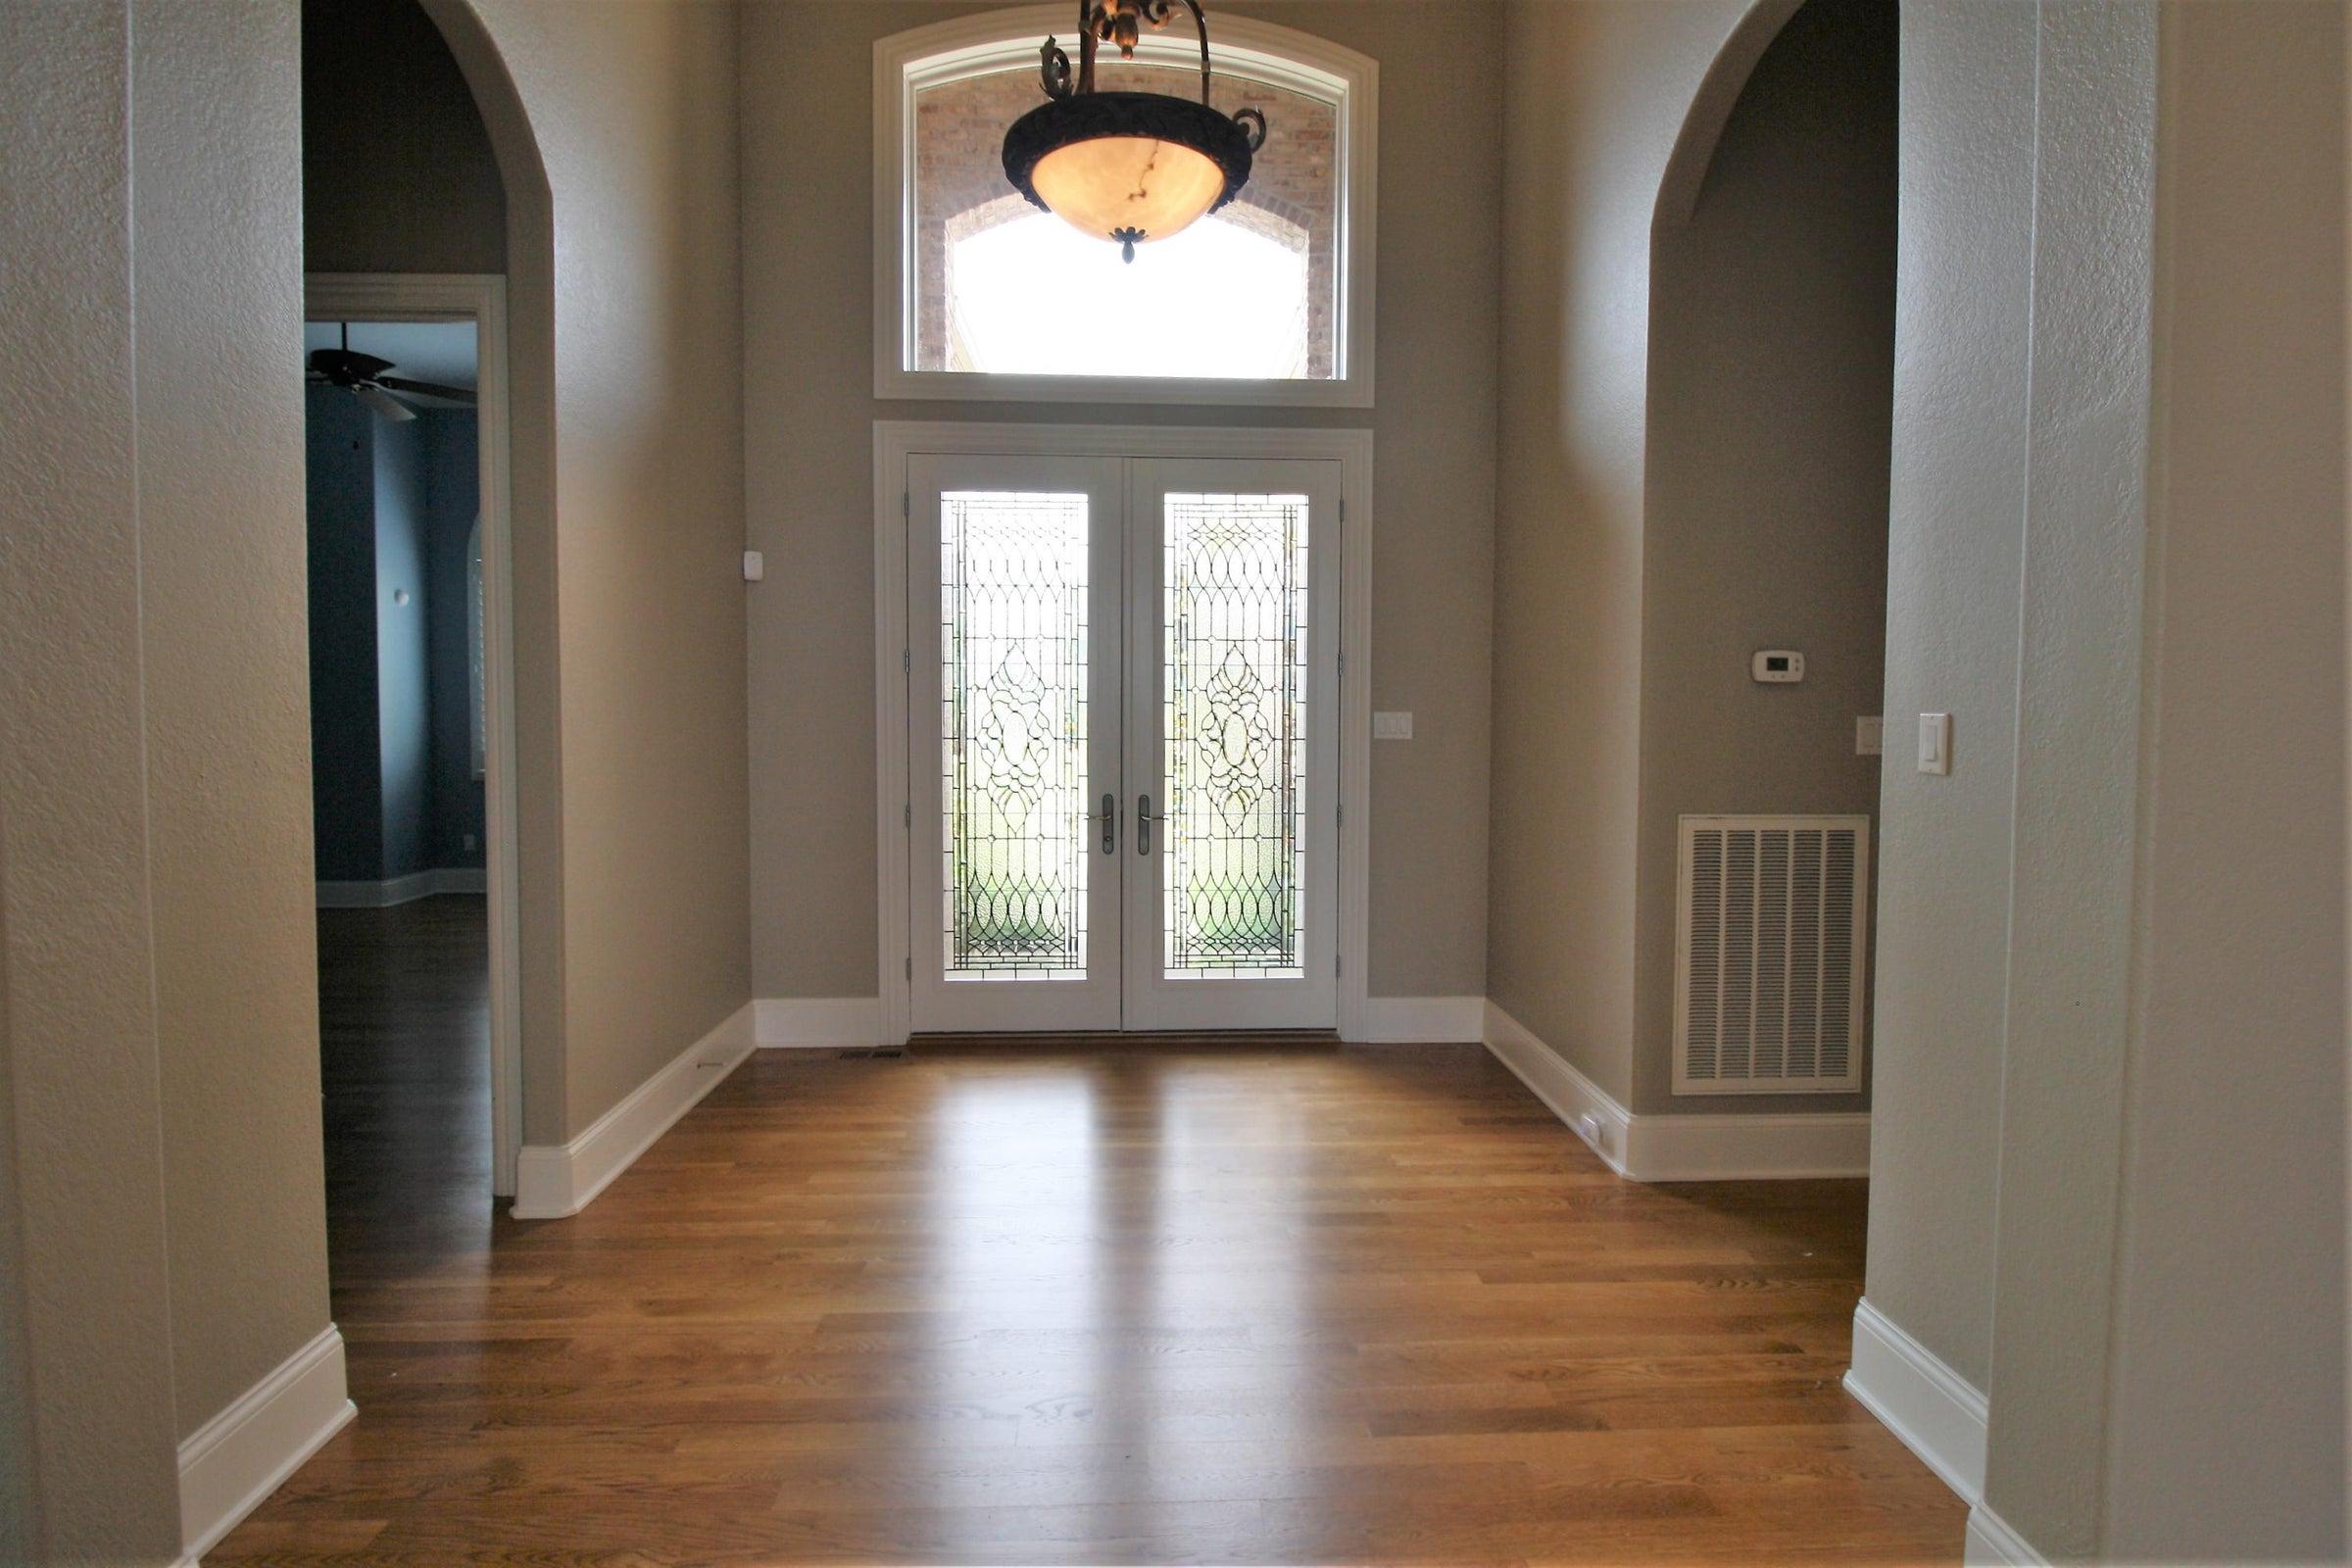 Double front doors lead to great room